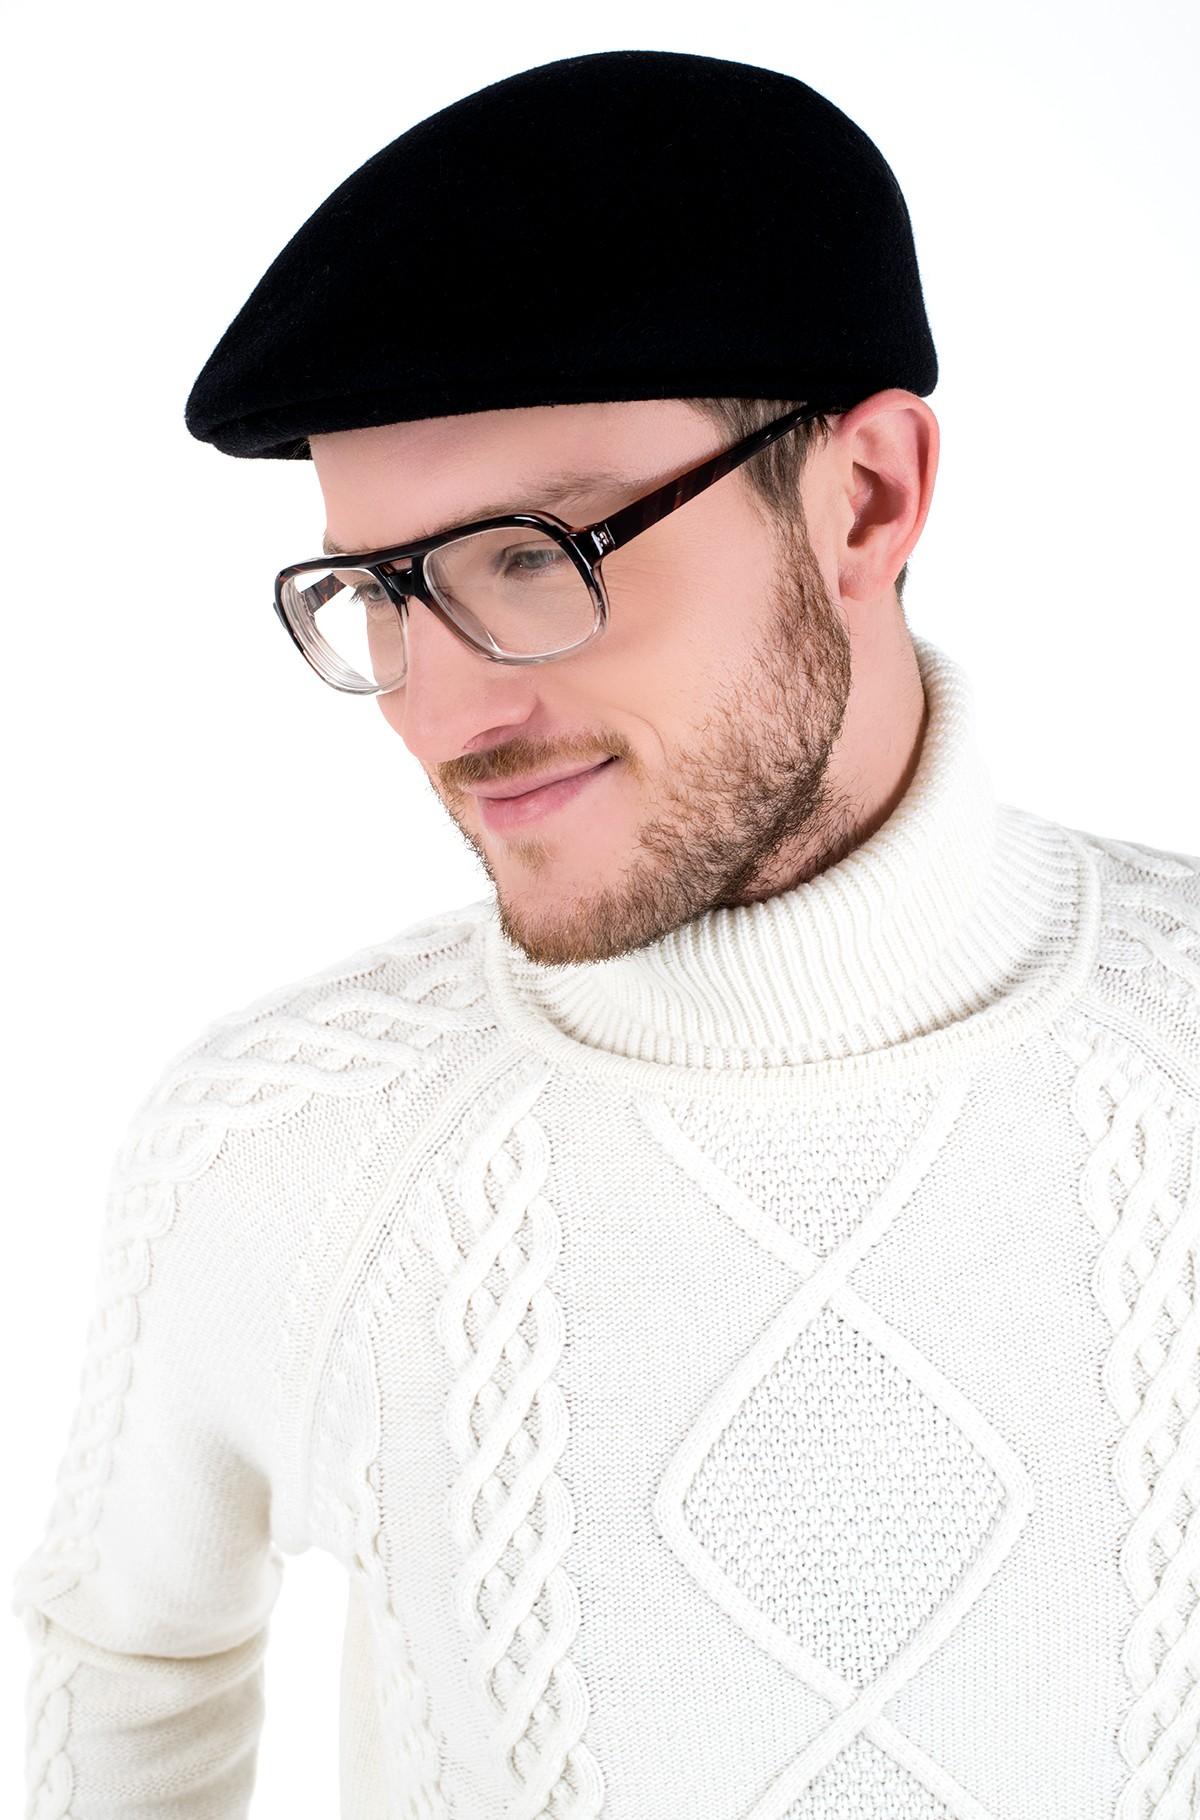 Tvido kepurė UPTOWN FLAT CAP-full-1